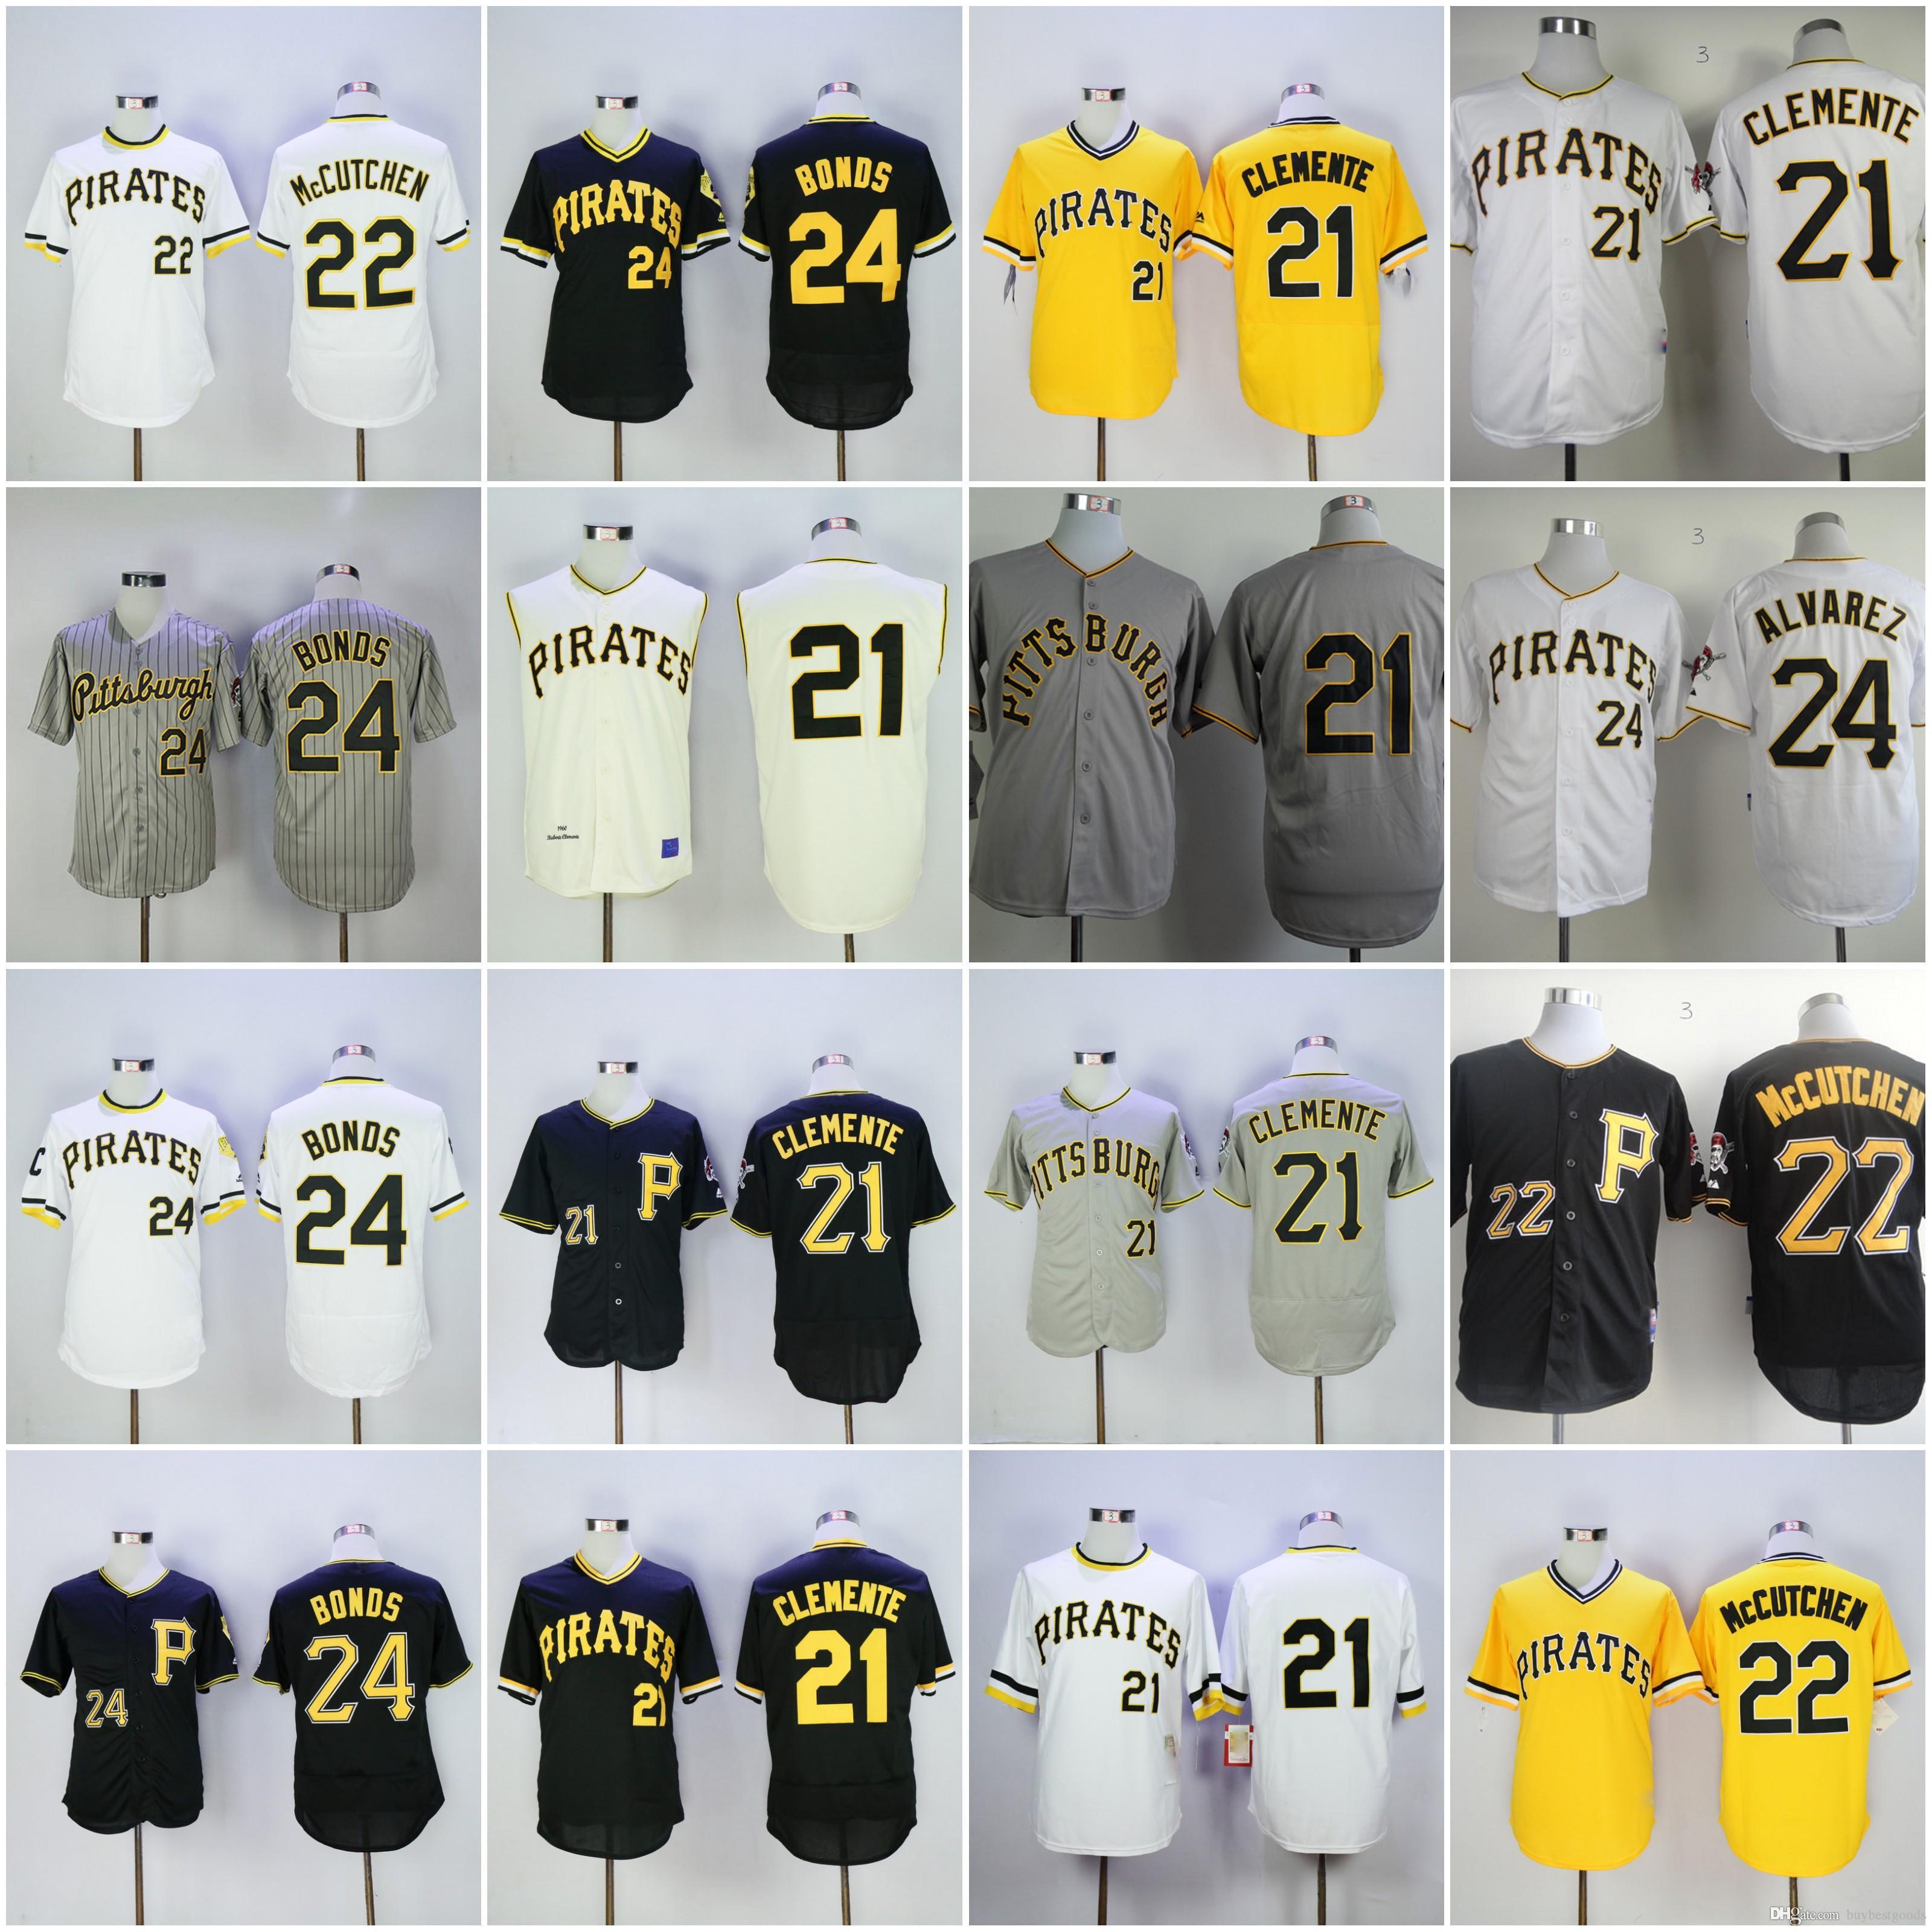 181c756ff 2017 21 Roberto Clemente Jersey Mens Pittsburgh Pirates 24 Barry Bonds 22  Andrew Mccutchen Flexbase Cooperstown ...